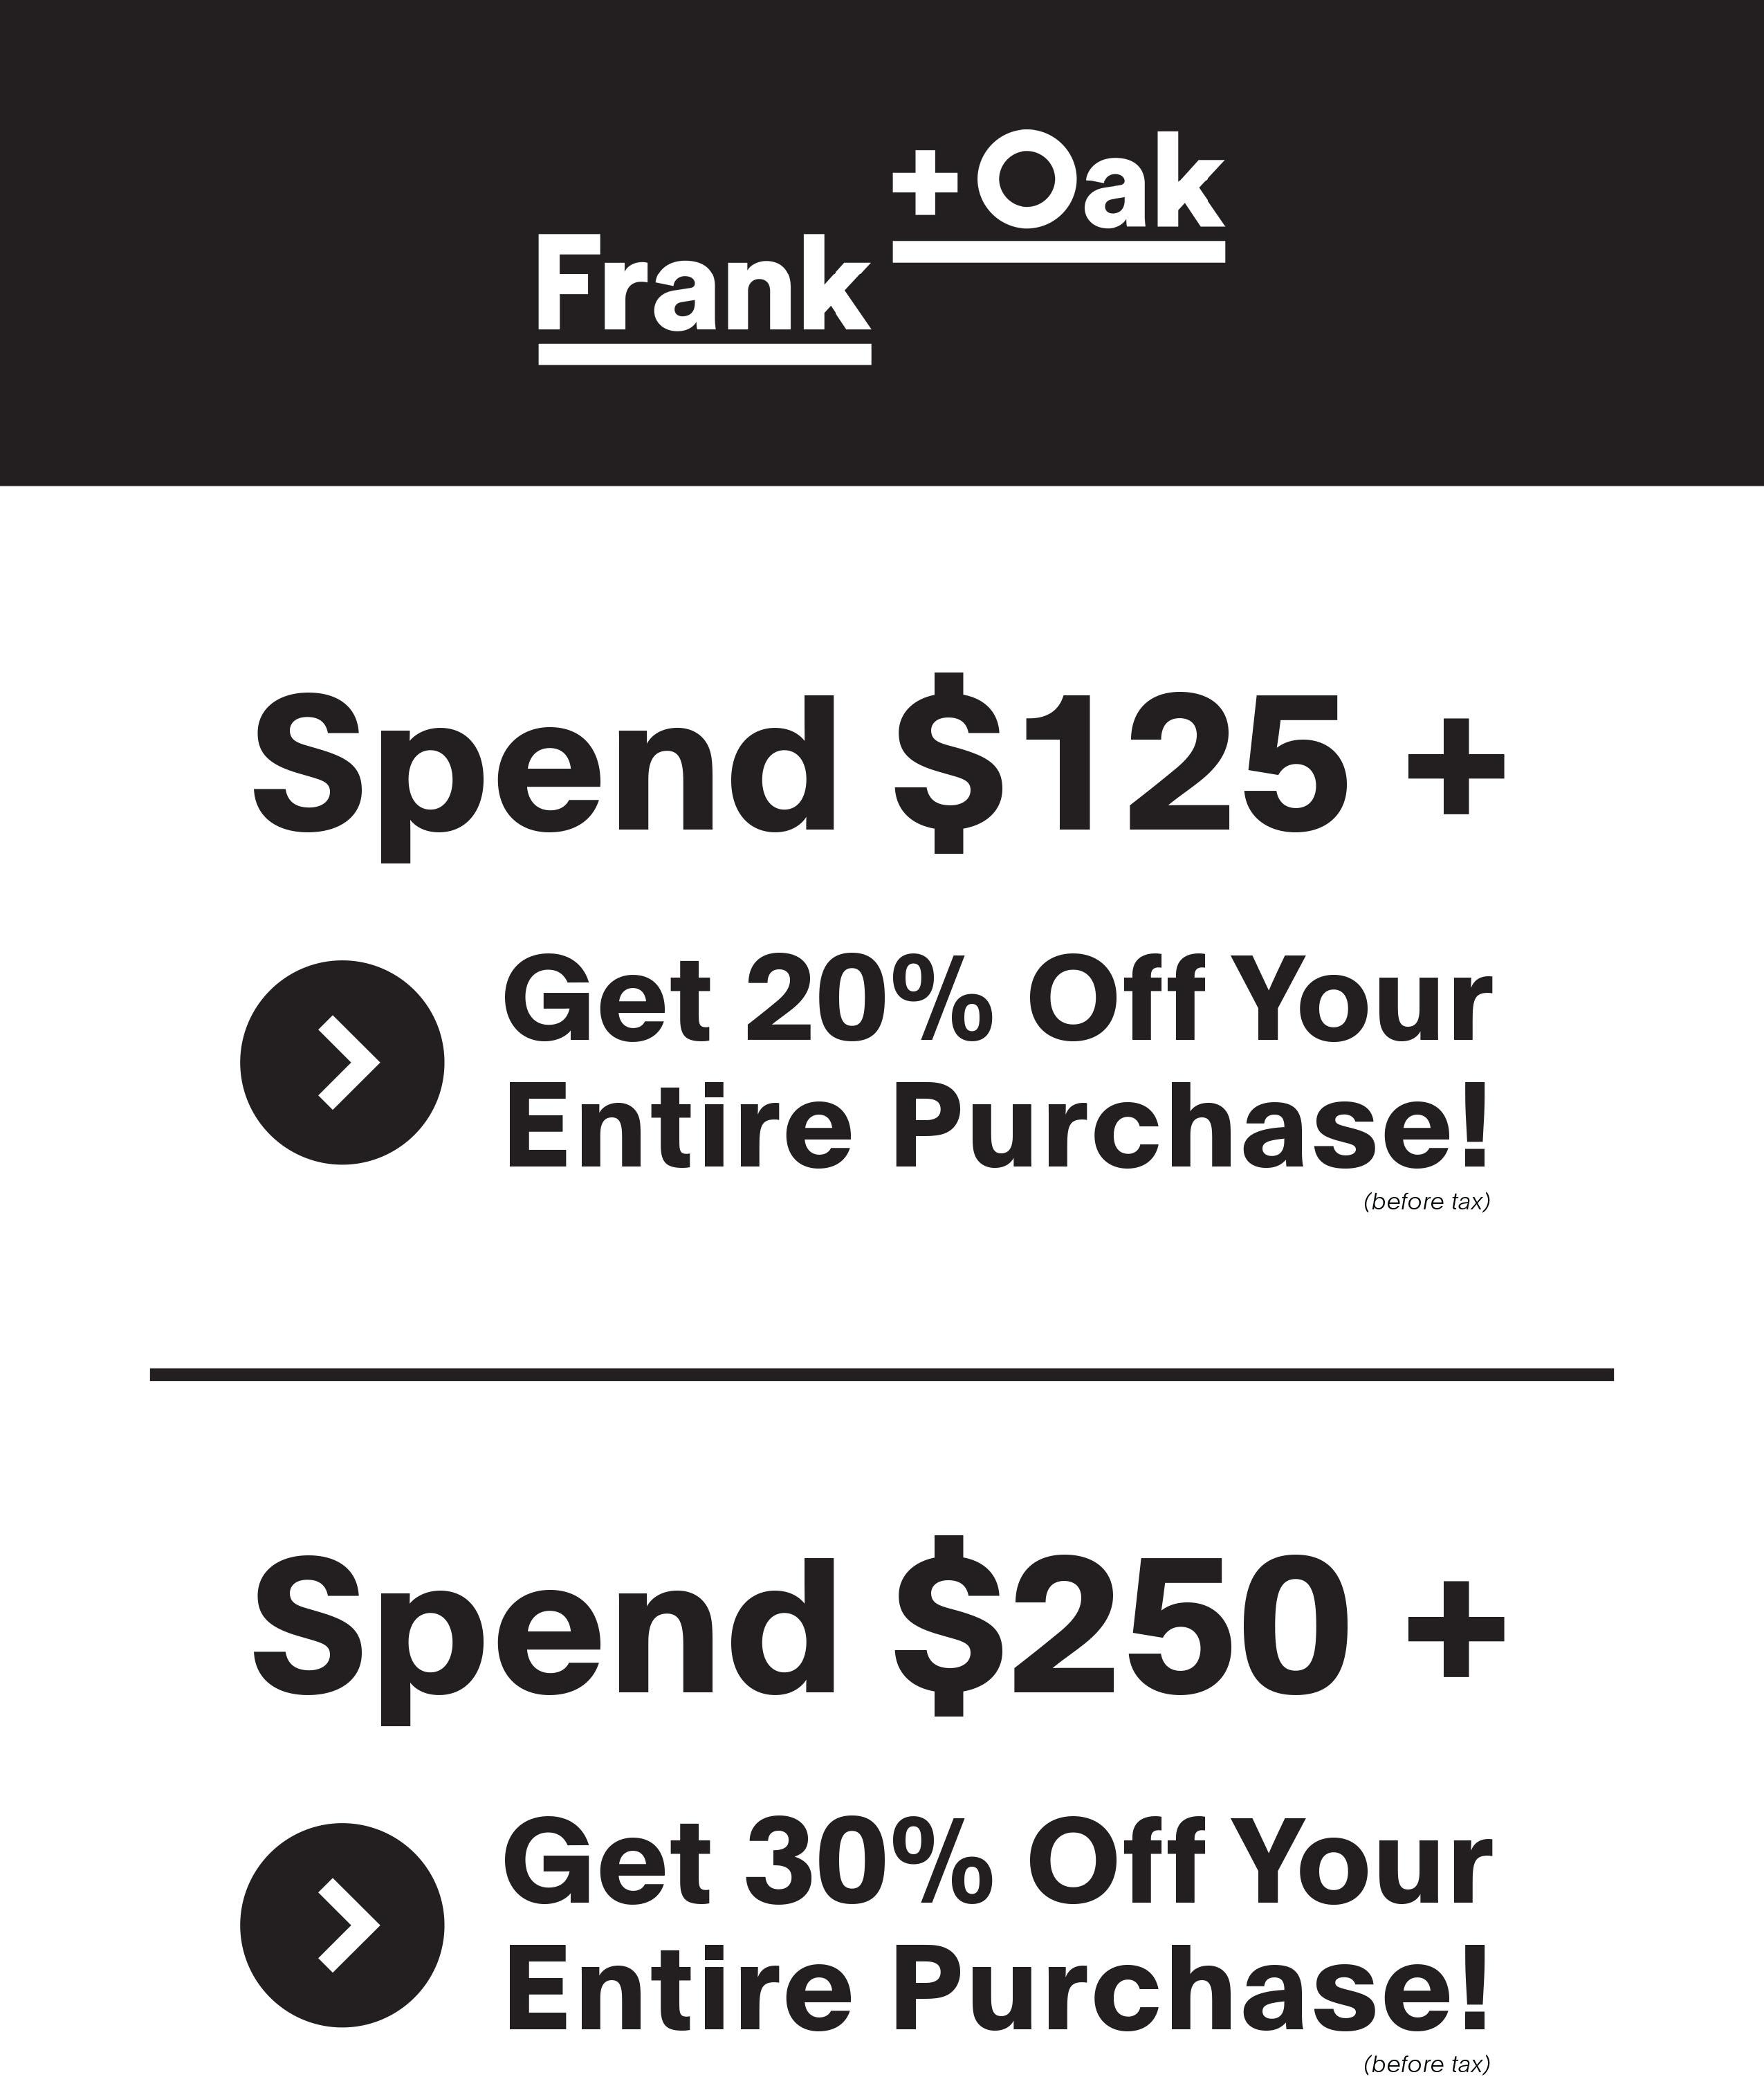 Last Chance To Shop The Frank Oak Toronto Warehouse Sale